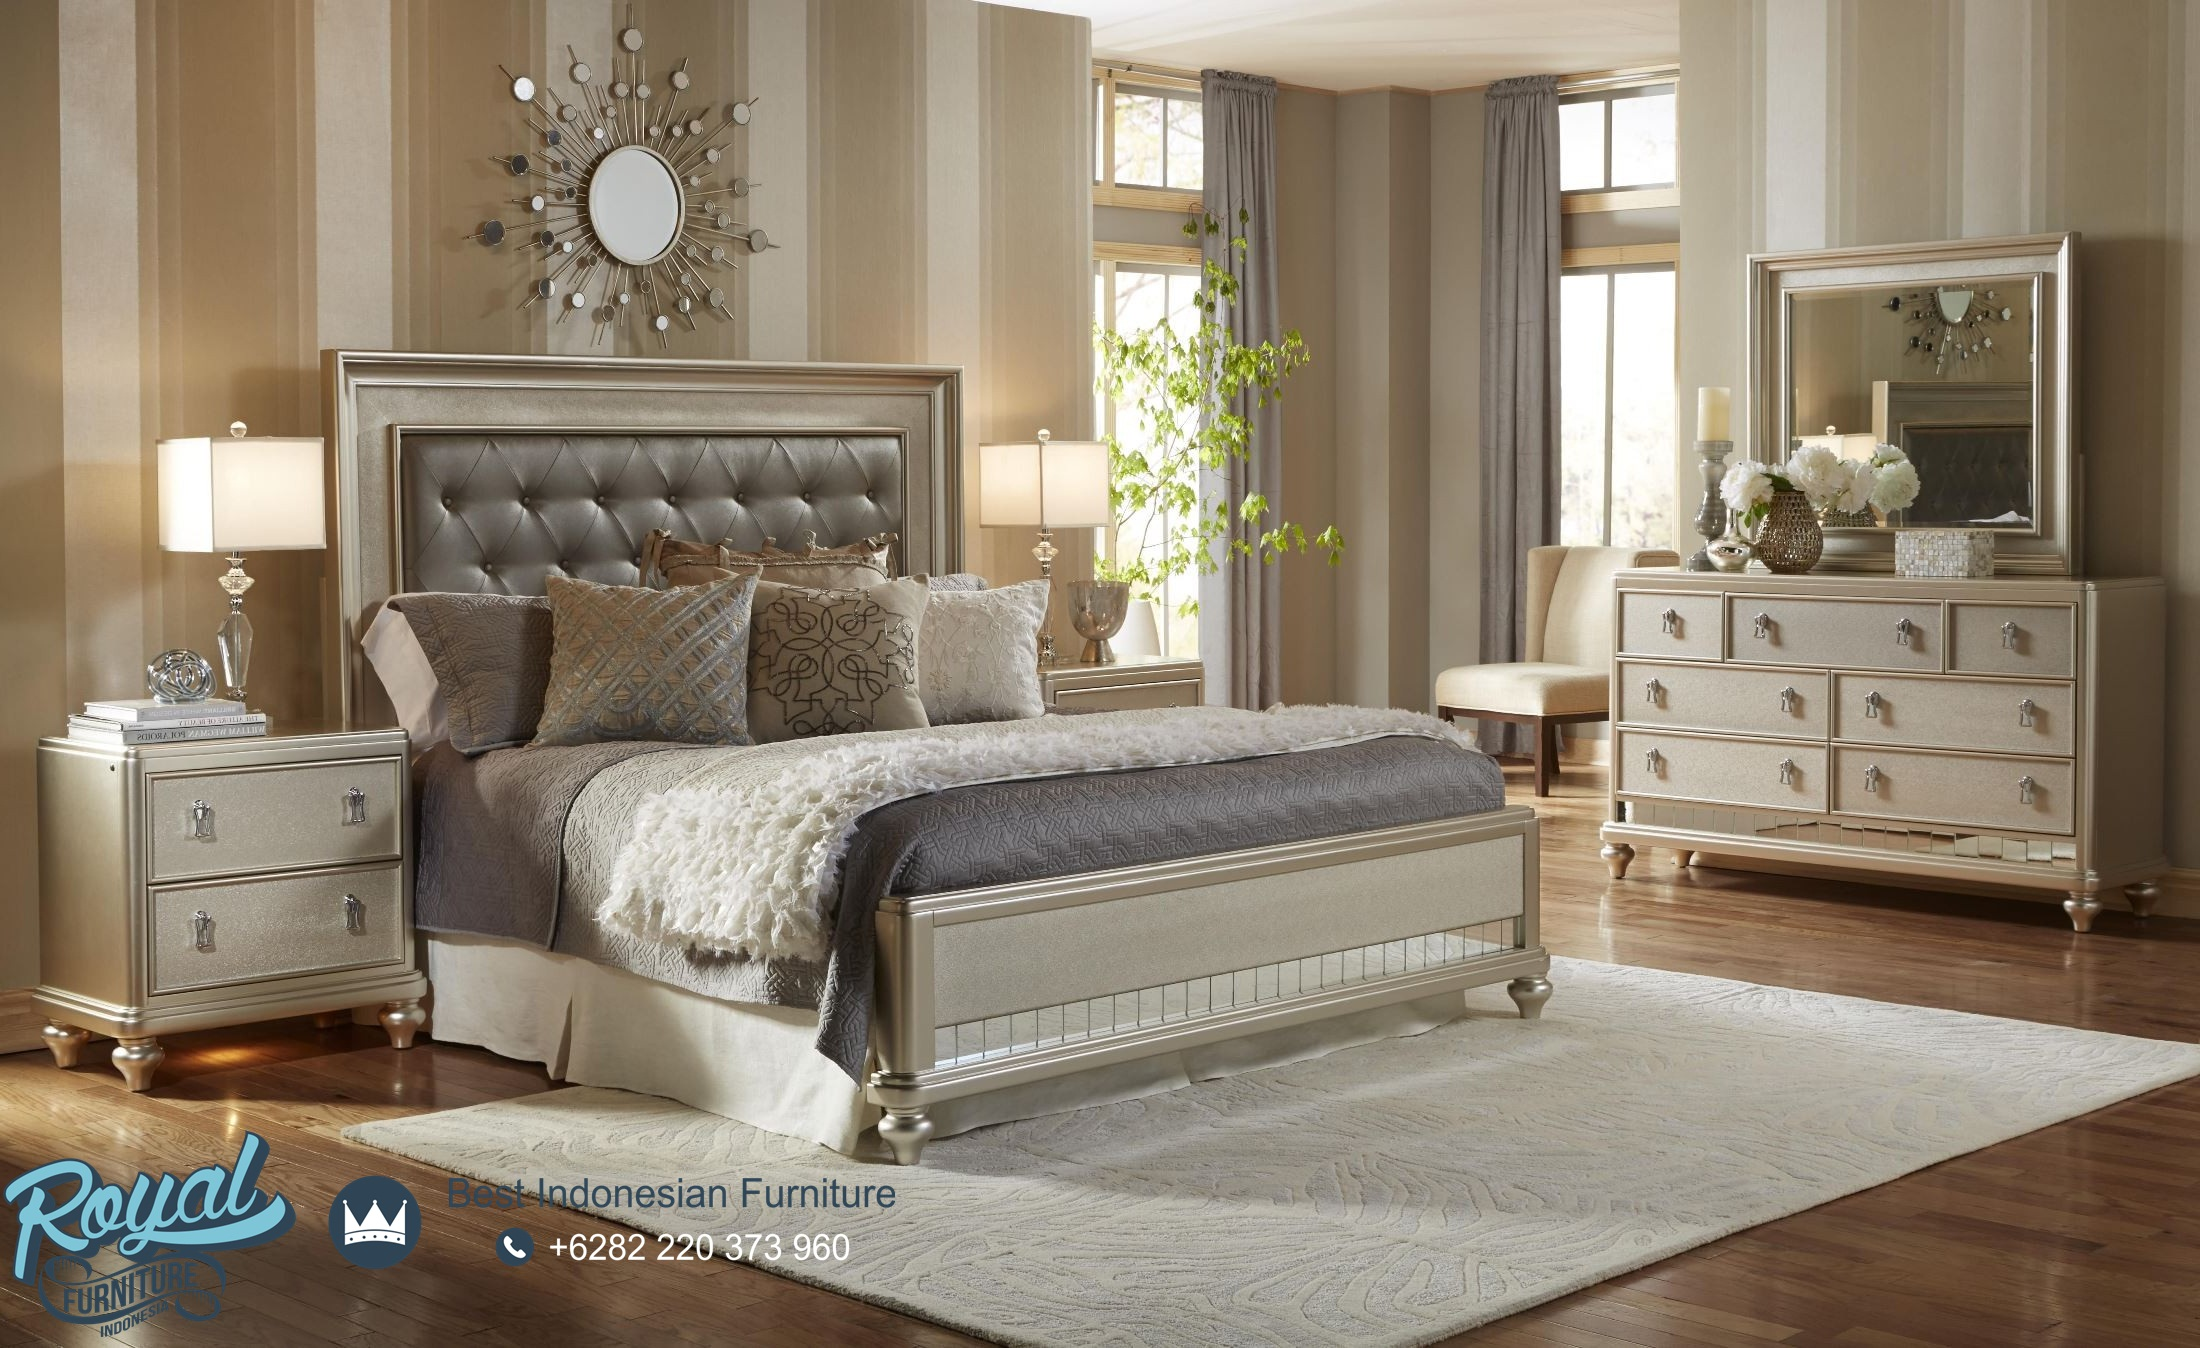 Kamar Set Tidur Minimalis Modern Mewah Terbaru California Royal